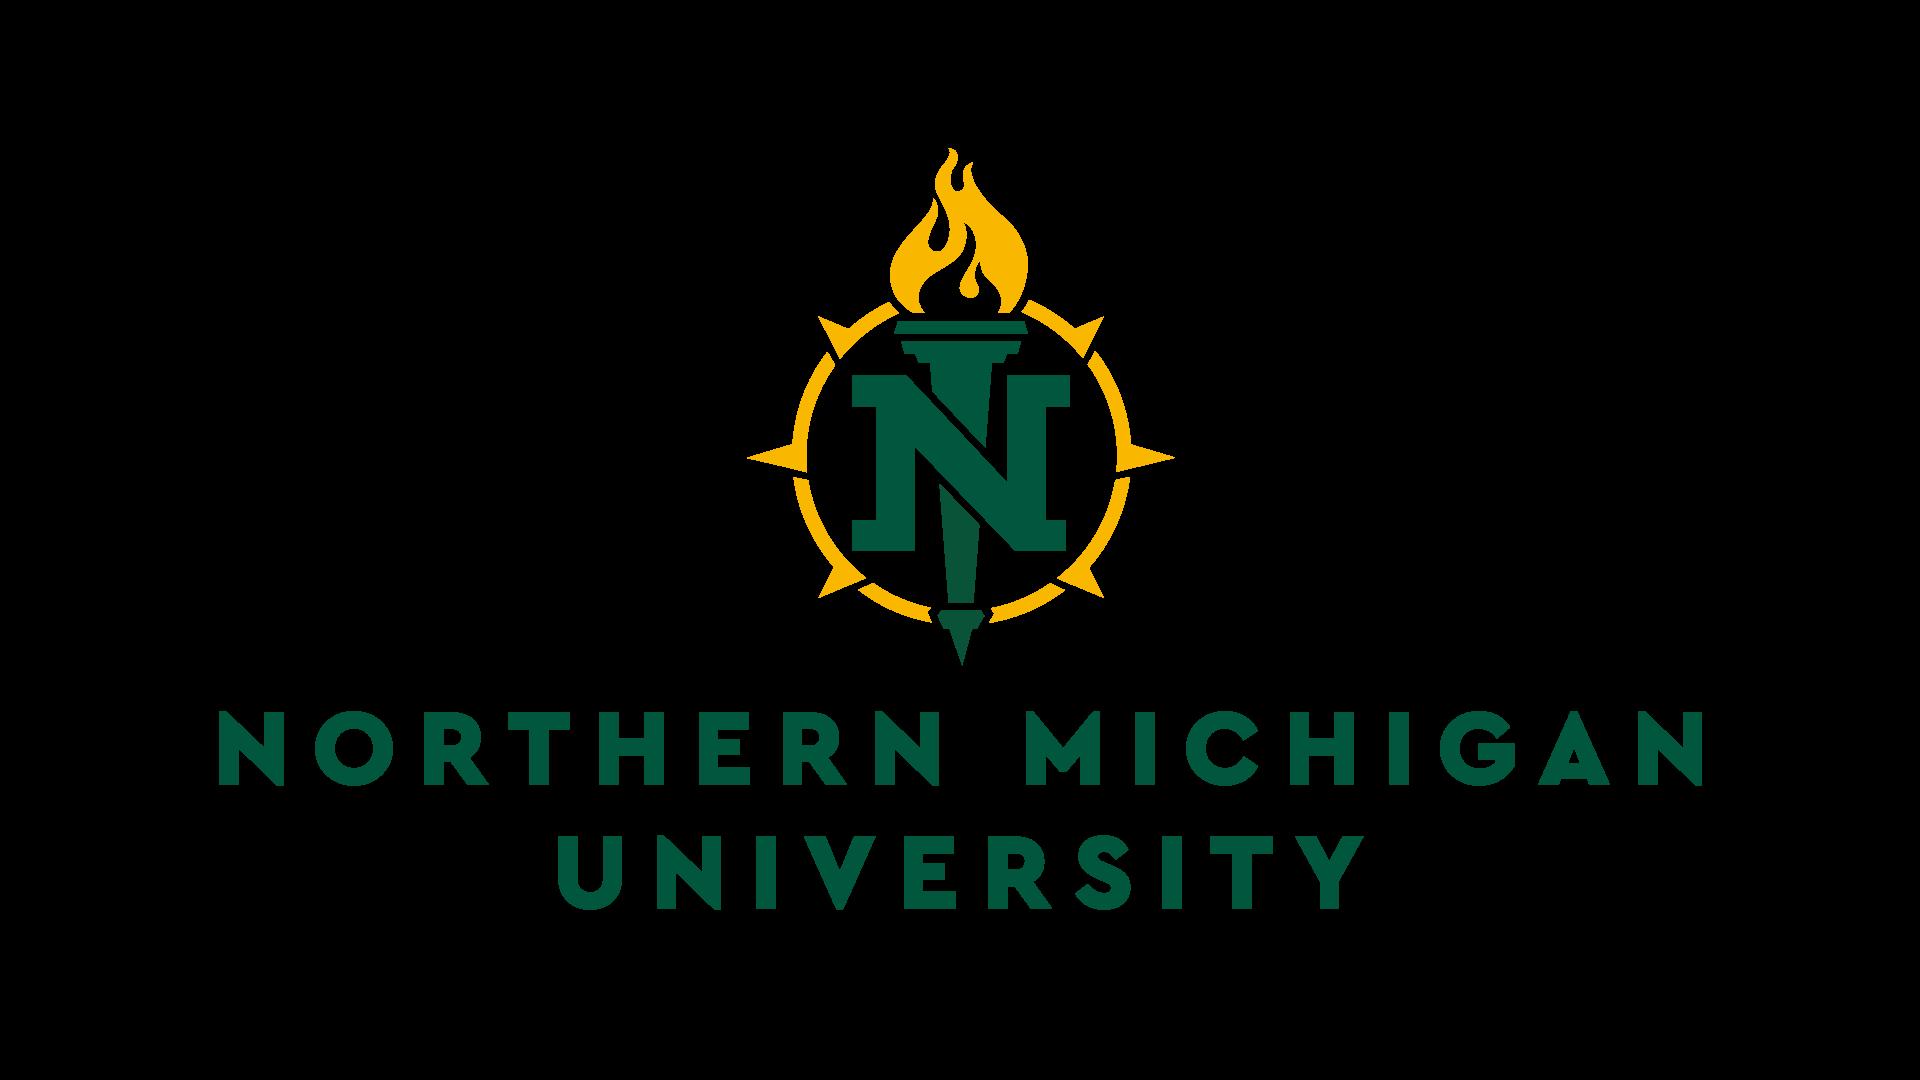 Northern Michigan University Northern Michigan University